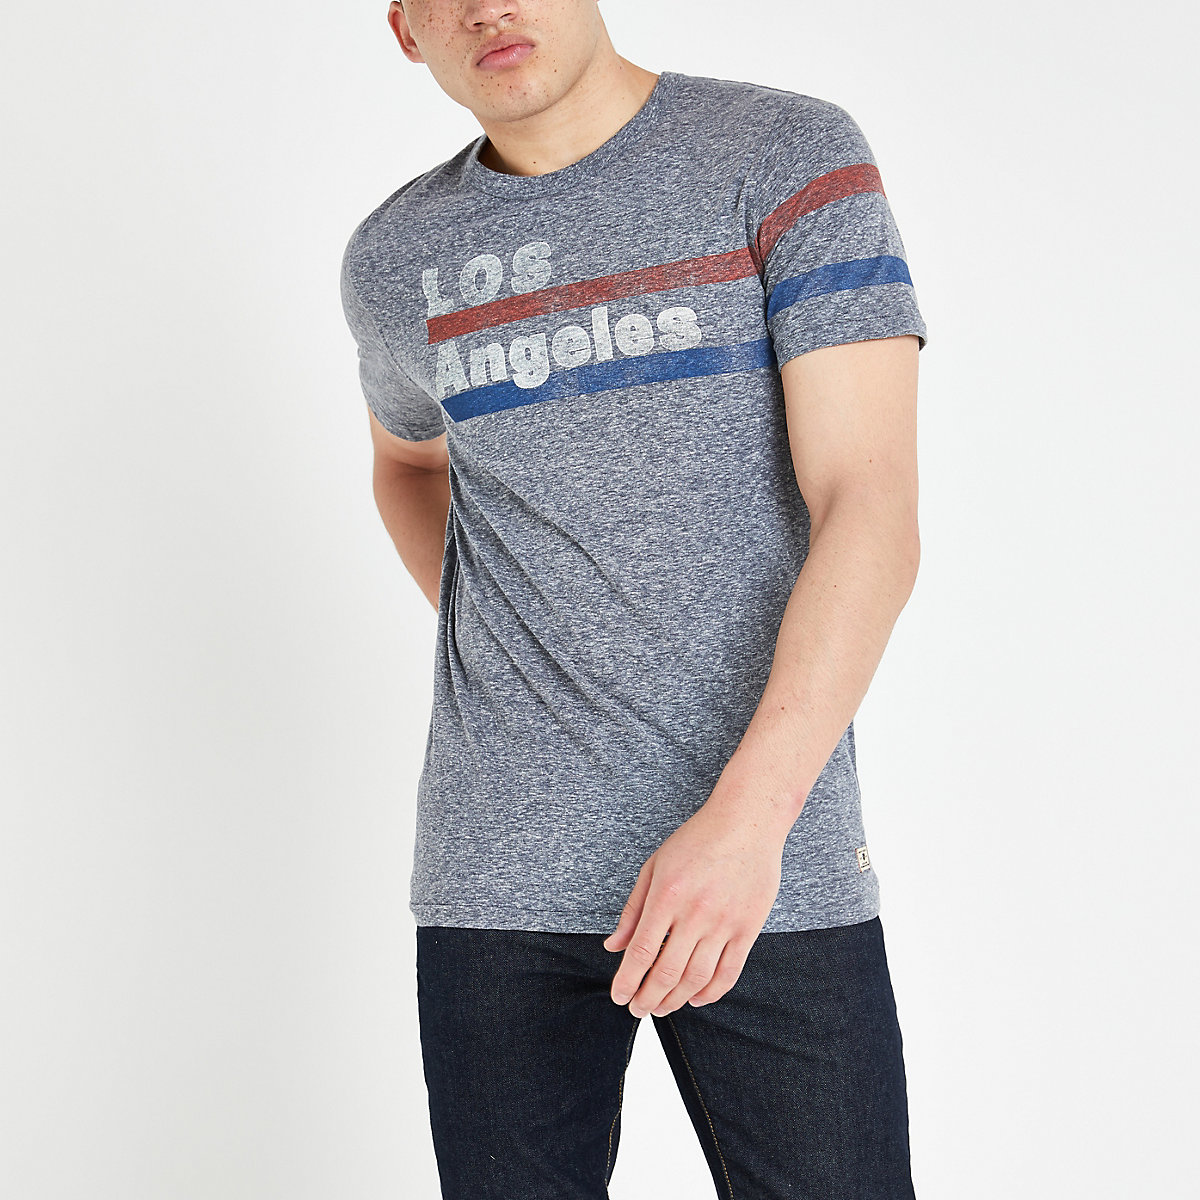 Jack and Jones grey 'Los Angeles' T-shirt